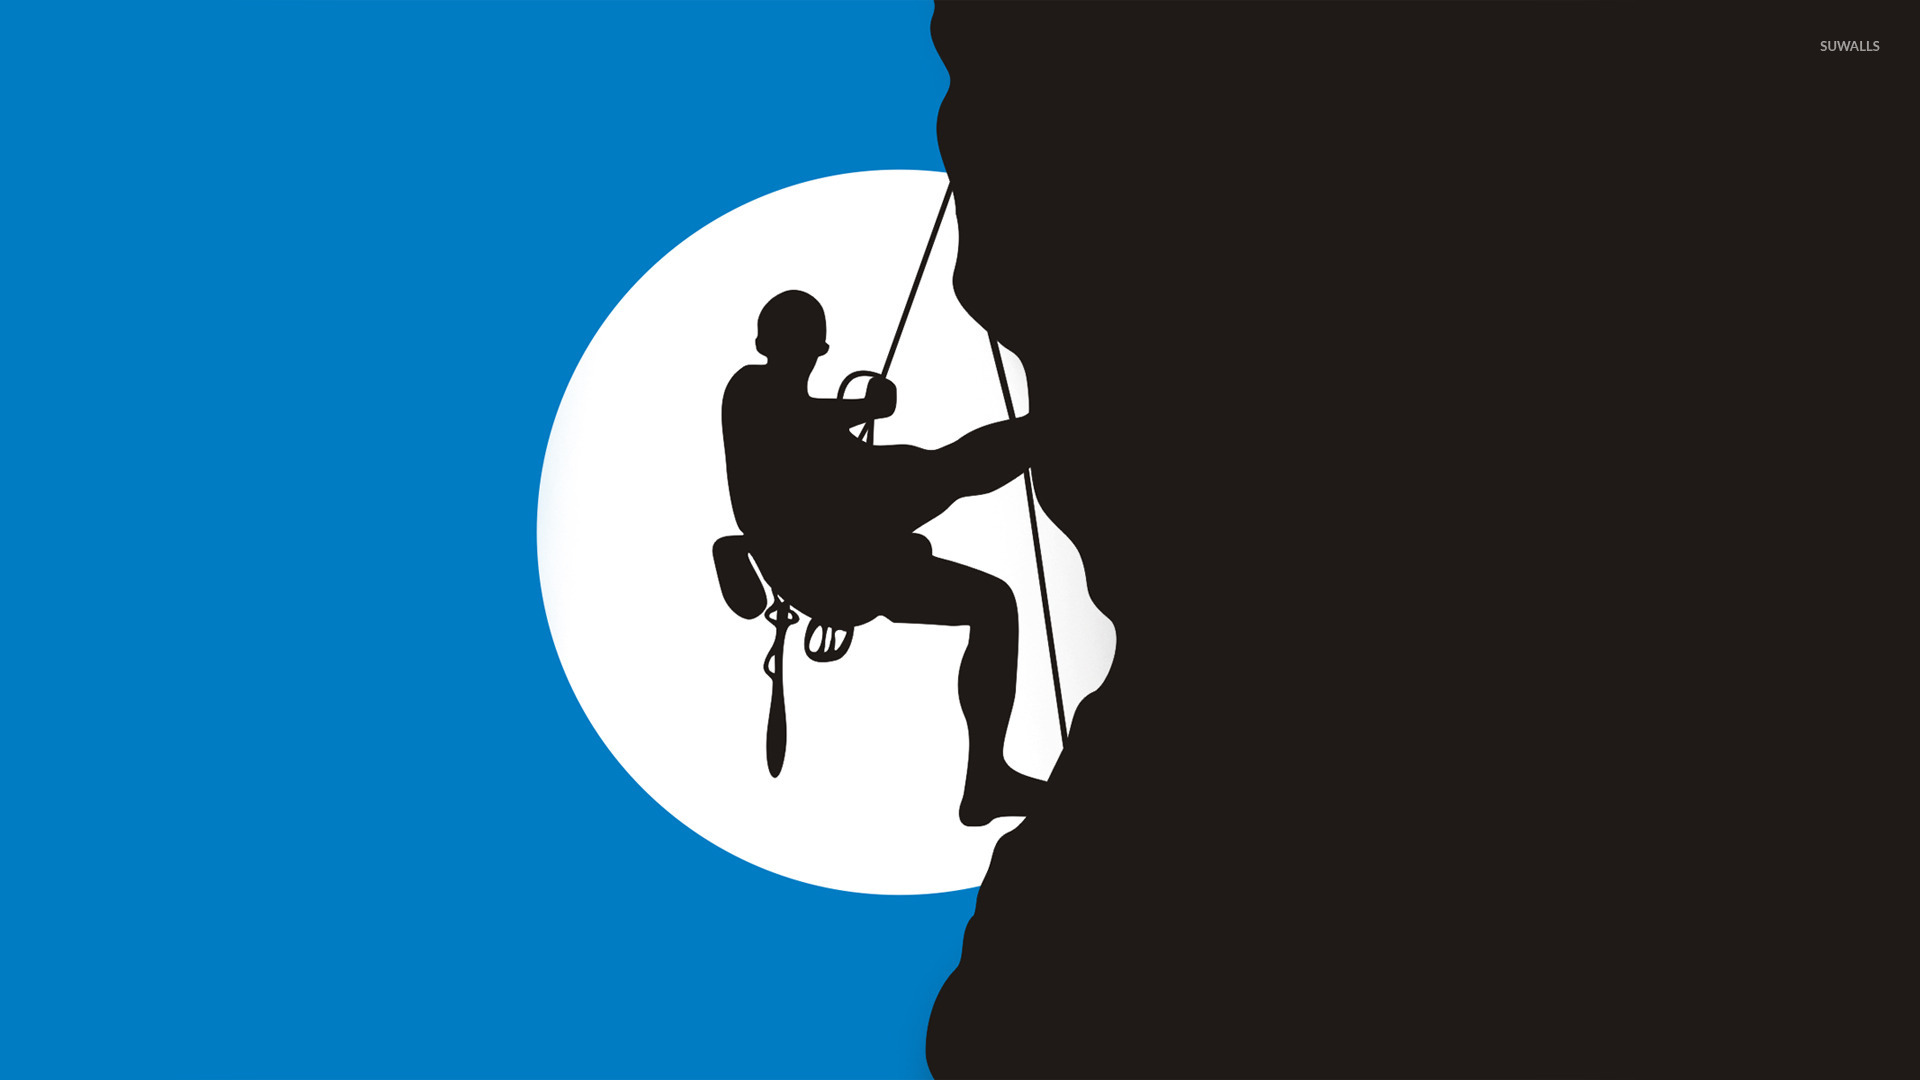 climber silhouette wallpaper vector wallpapers 20110